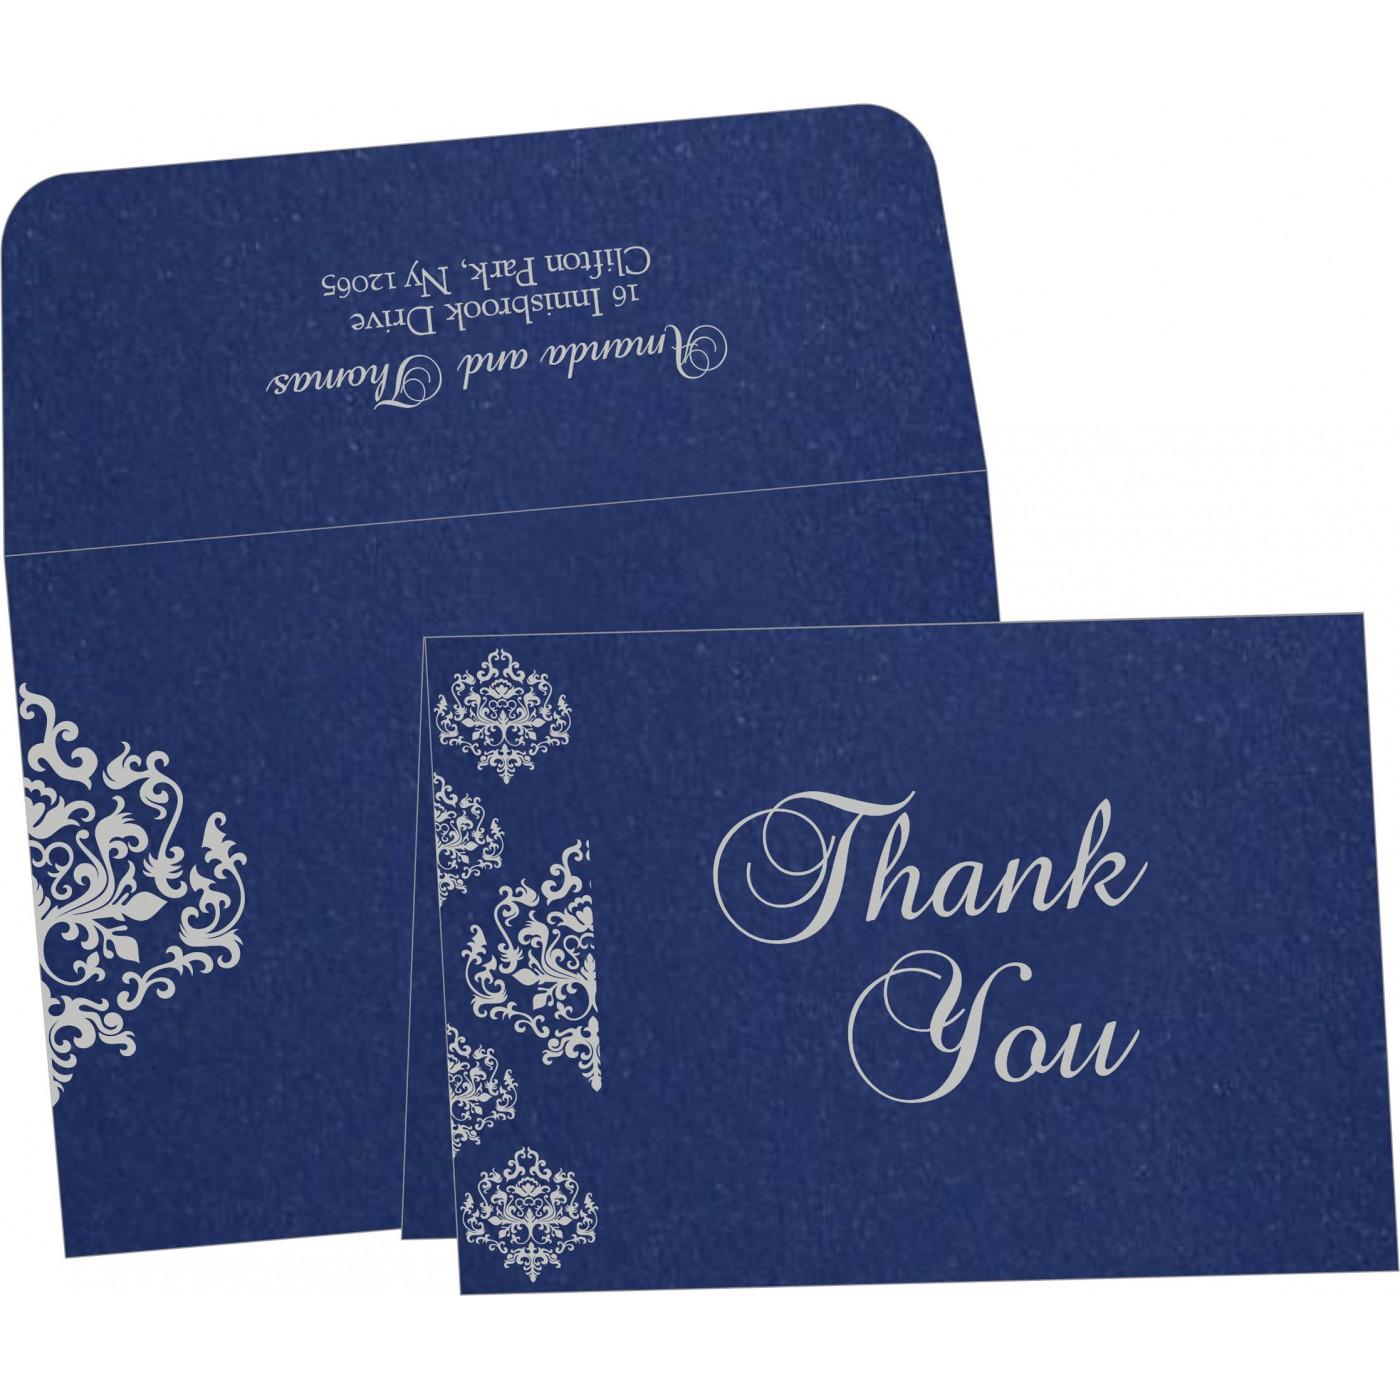 Thank You Cards : CTYC-8254C - IndianWeddingCards